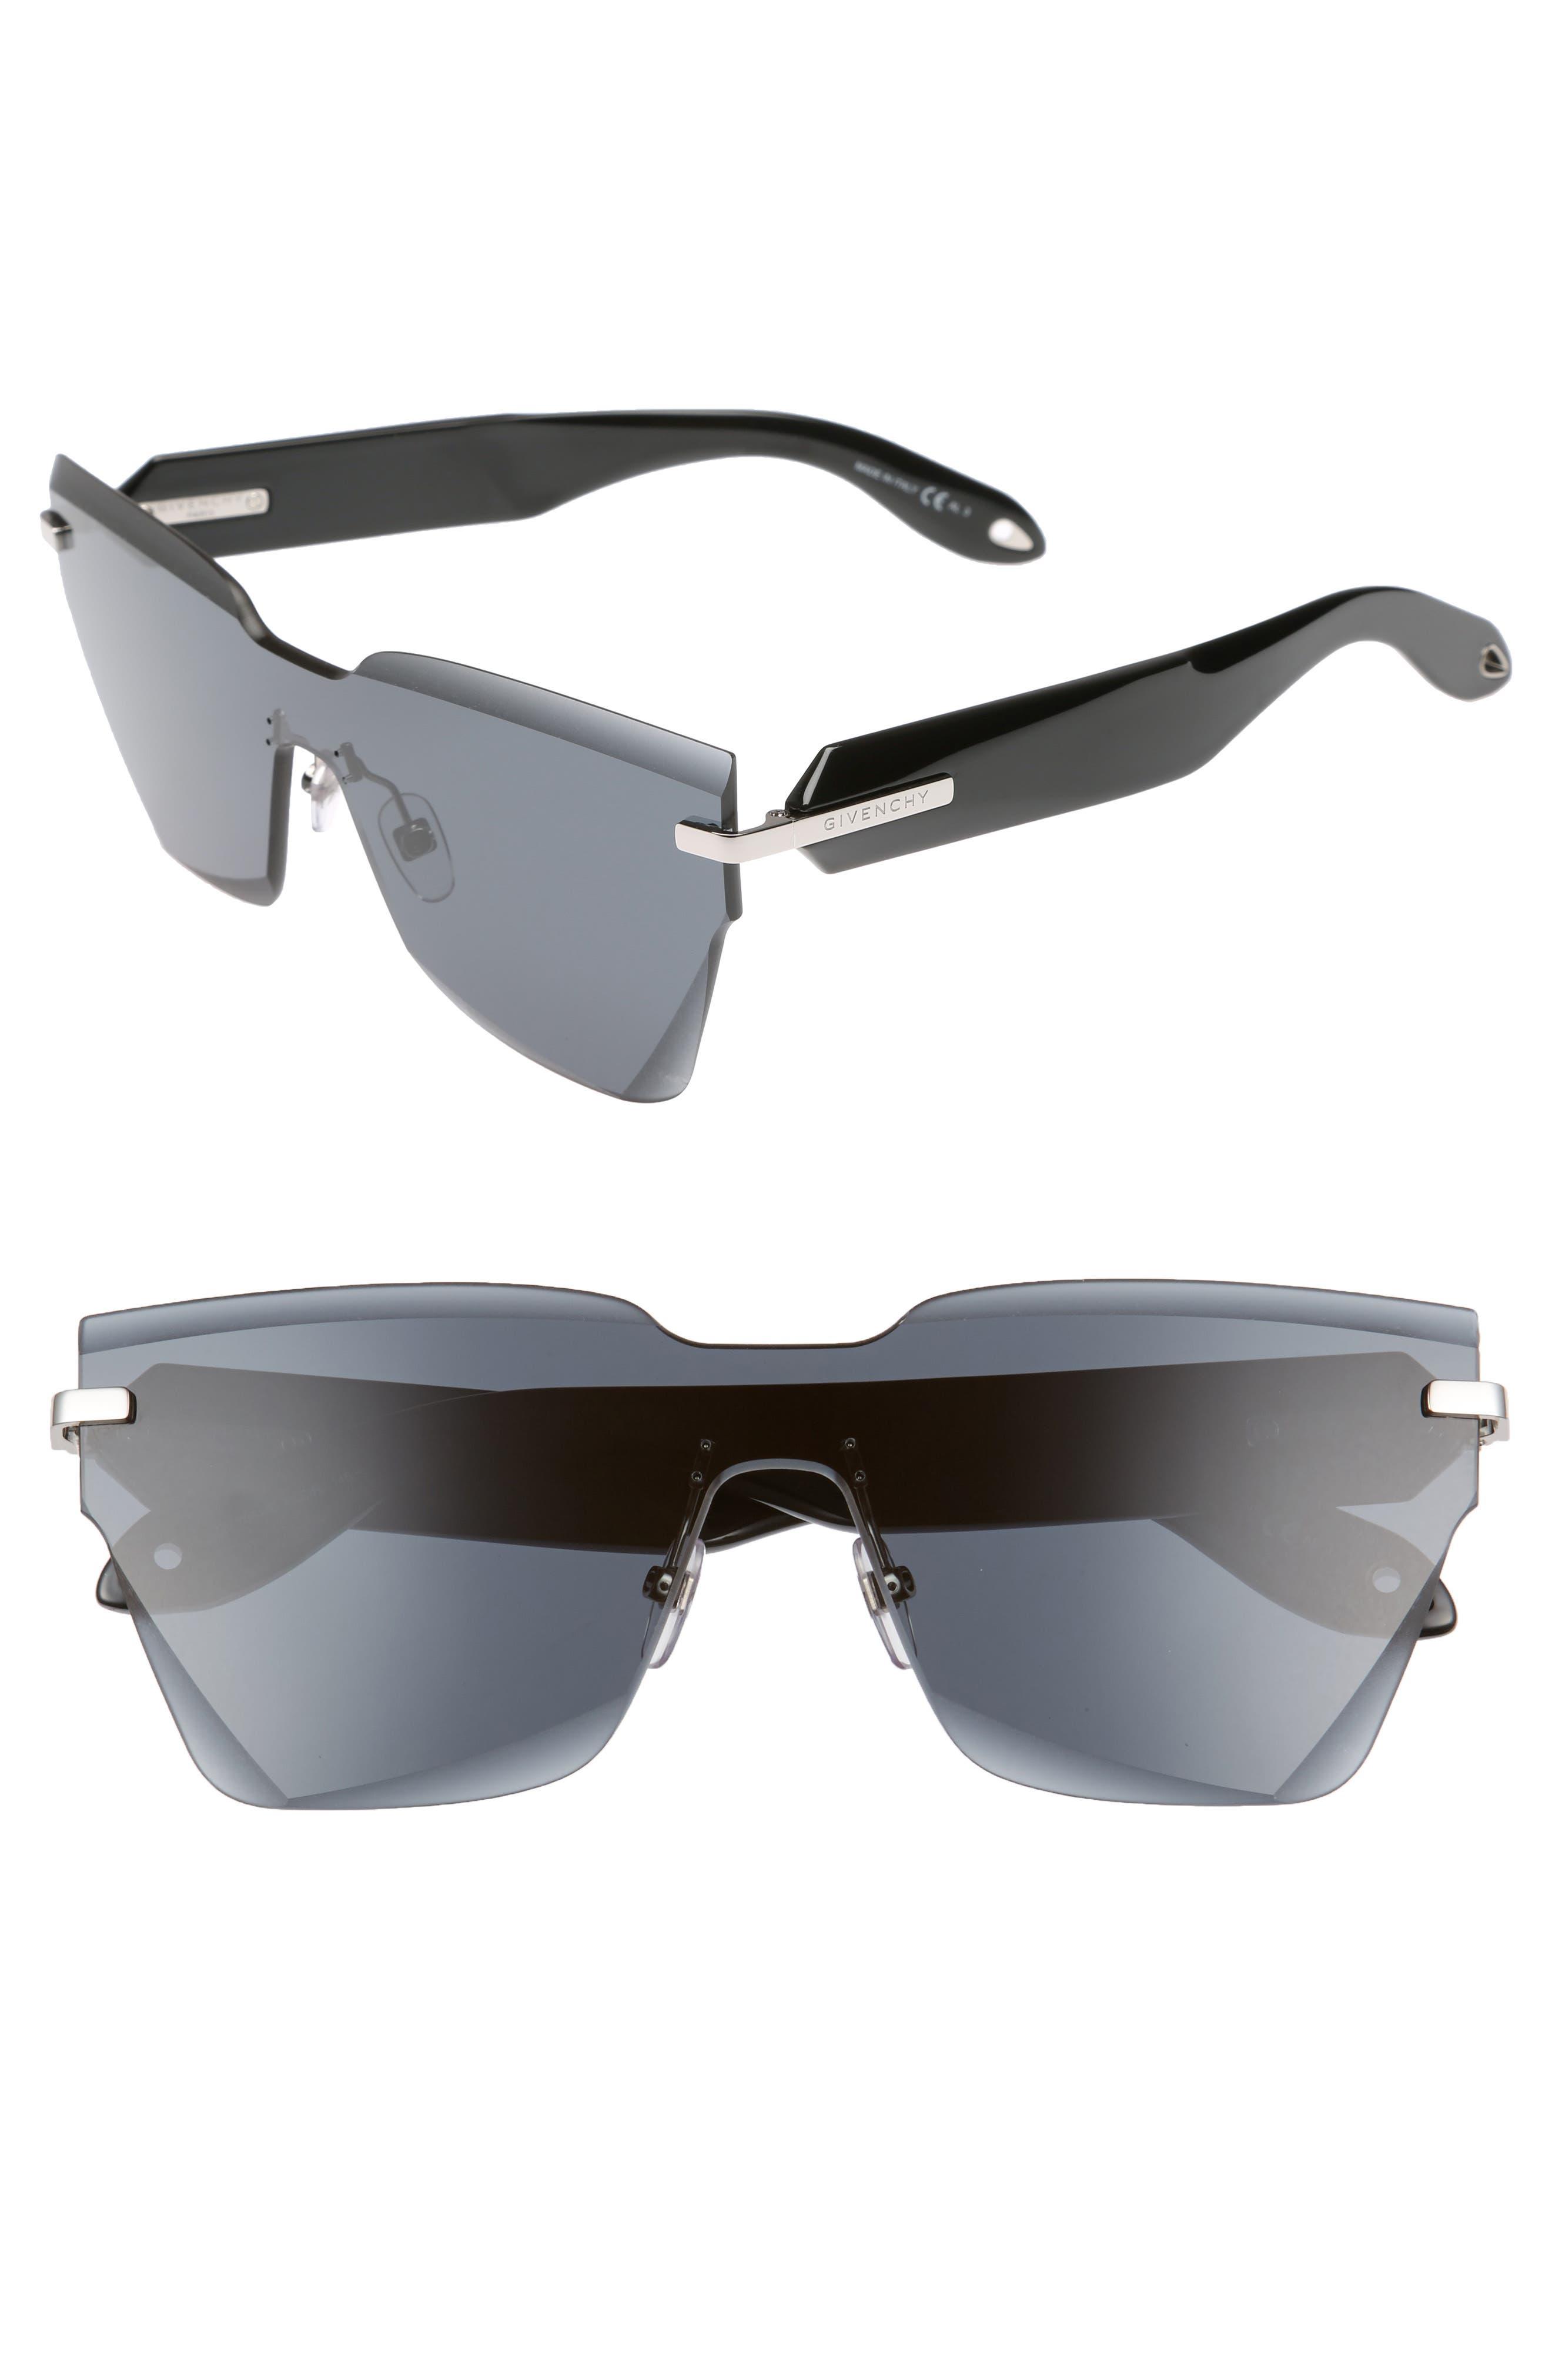 55mm Rimless Shield Sunglasses,                             Main thumbnail 1, color,                             GREY BLACK